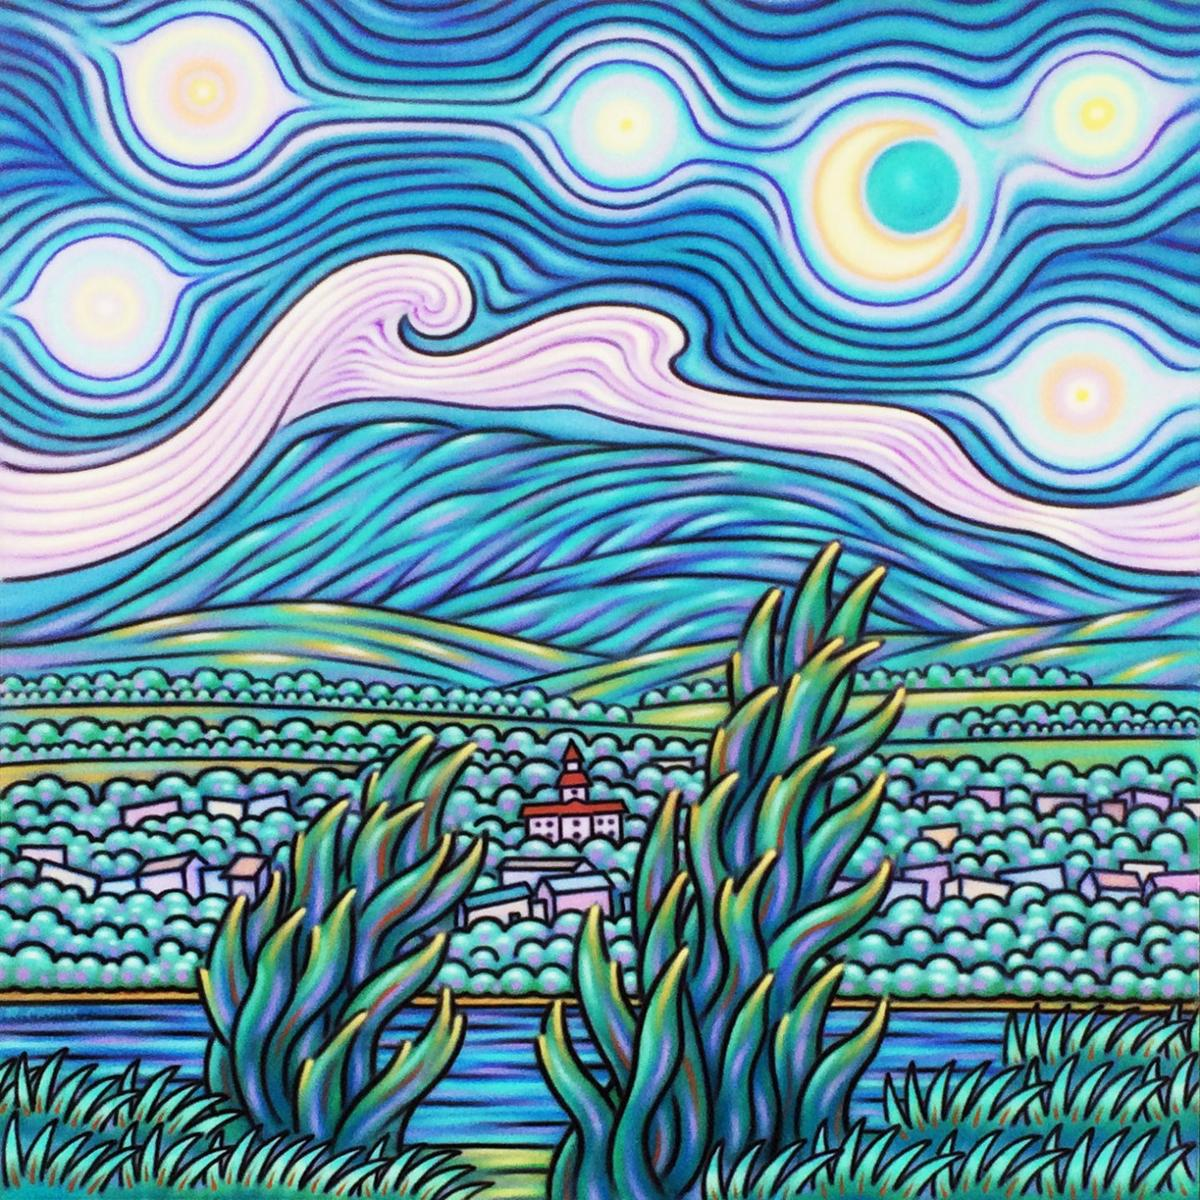 Rip Cronk's 'Starry Peak'